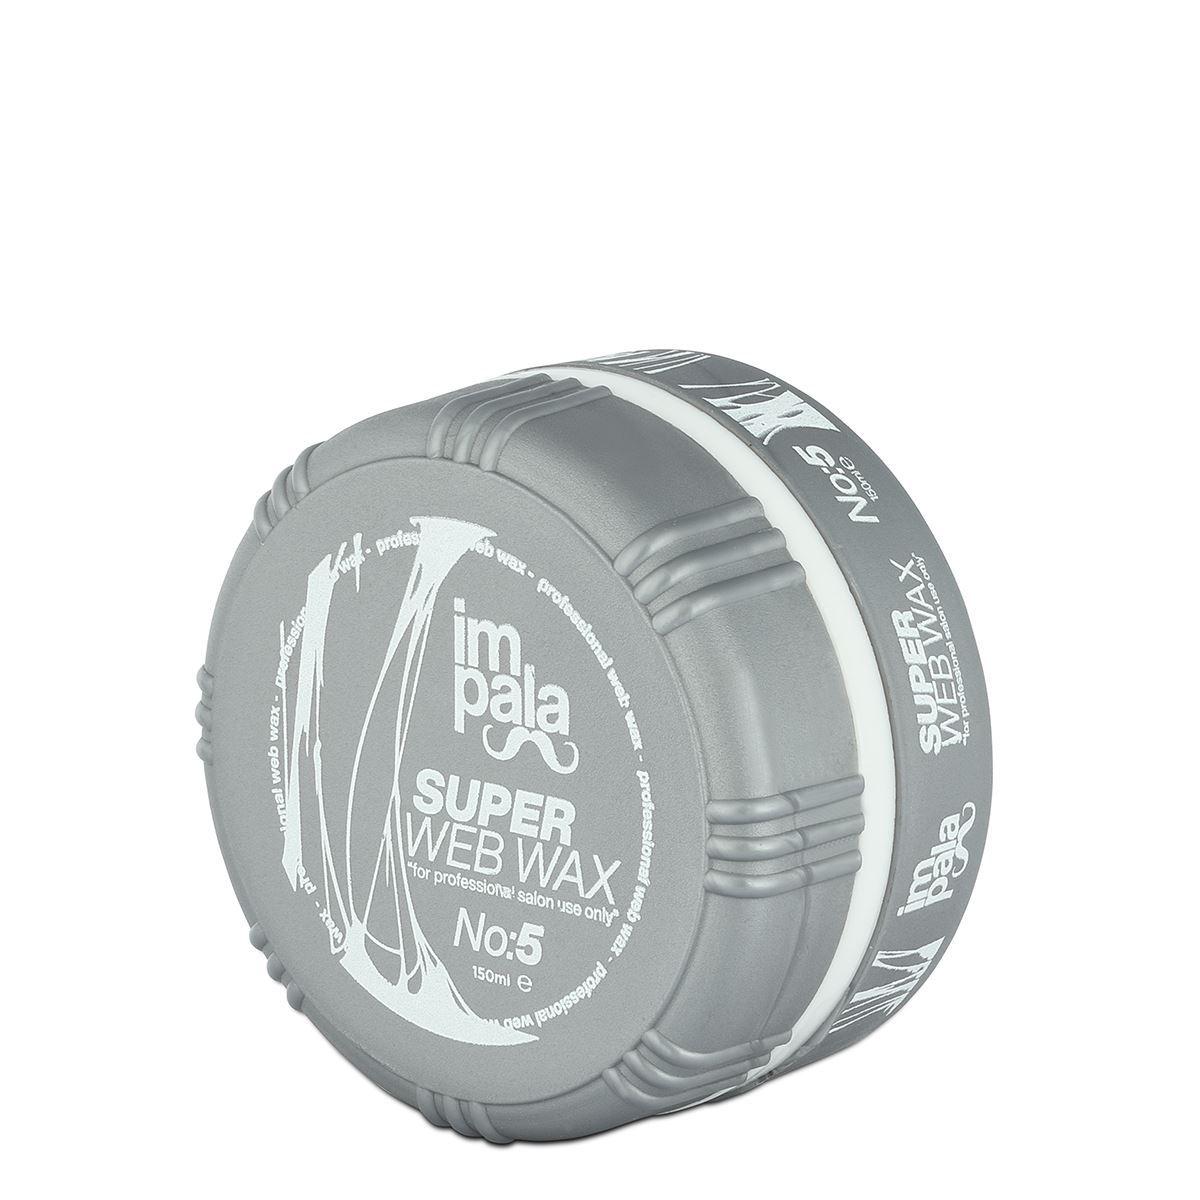 Impala No 5 Süper Web Wax 150ml